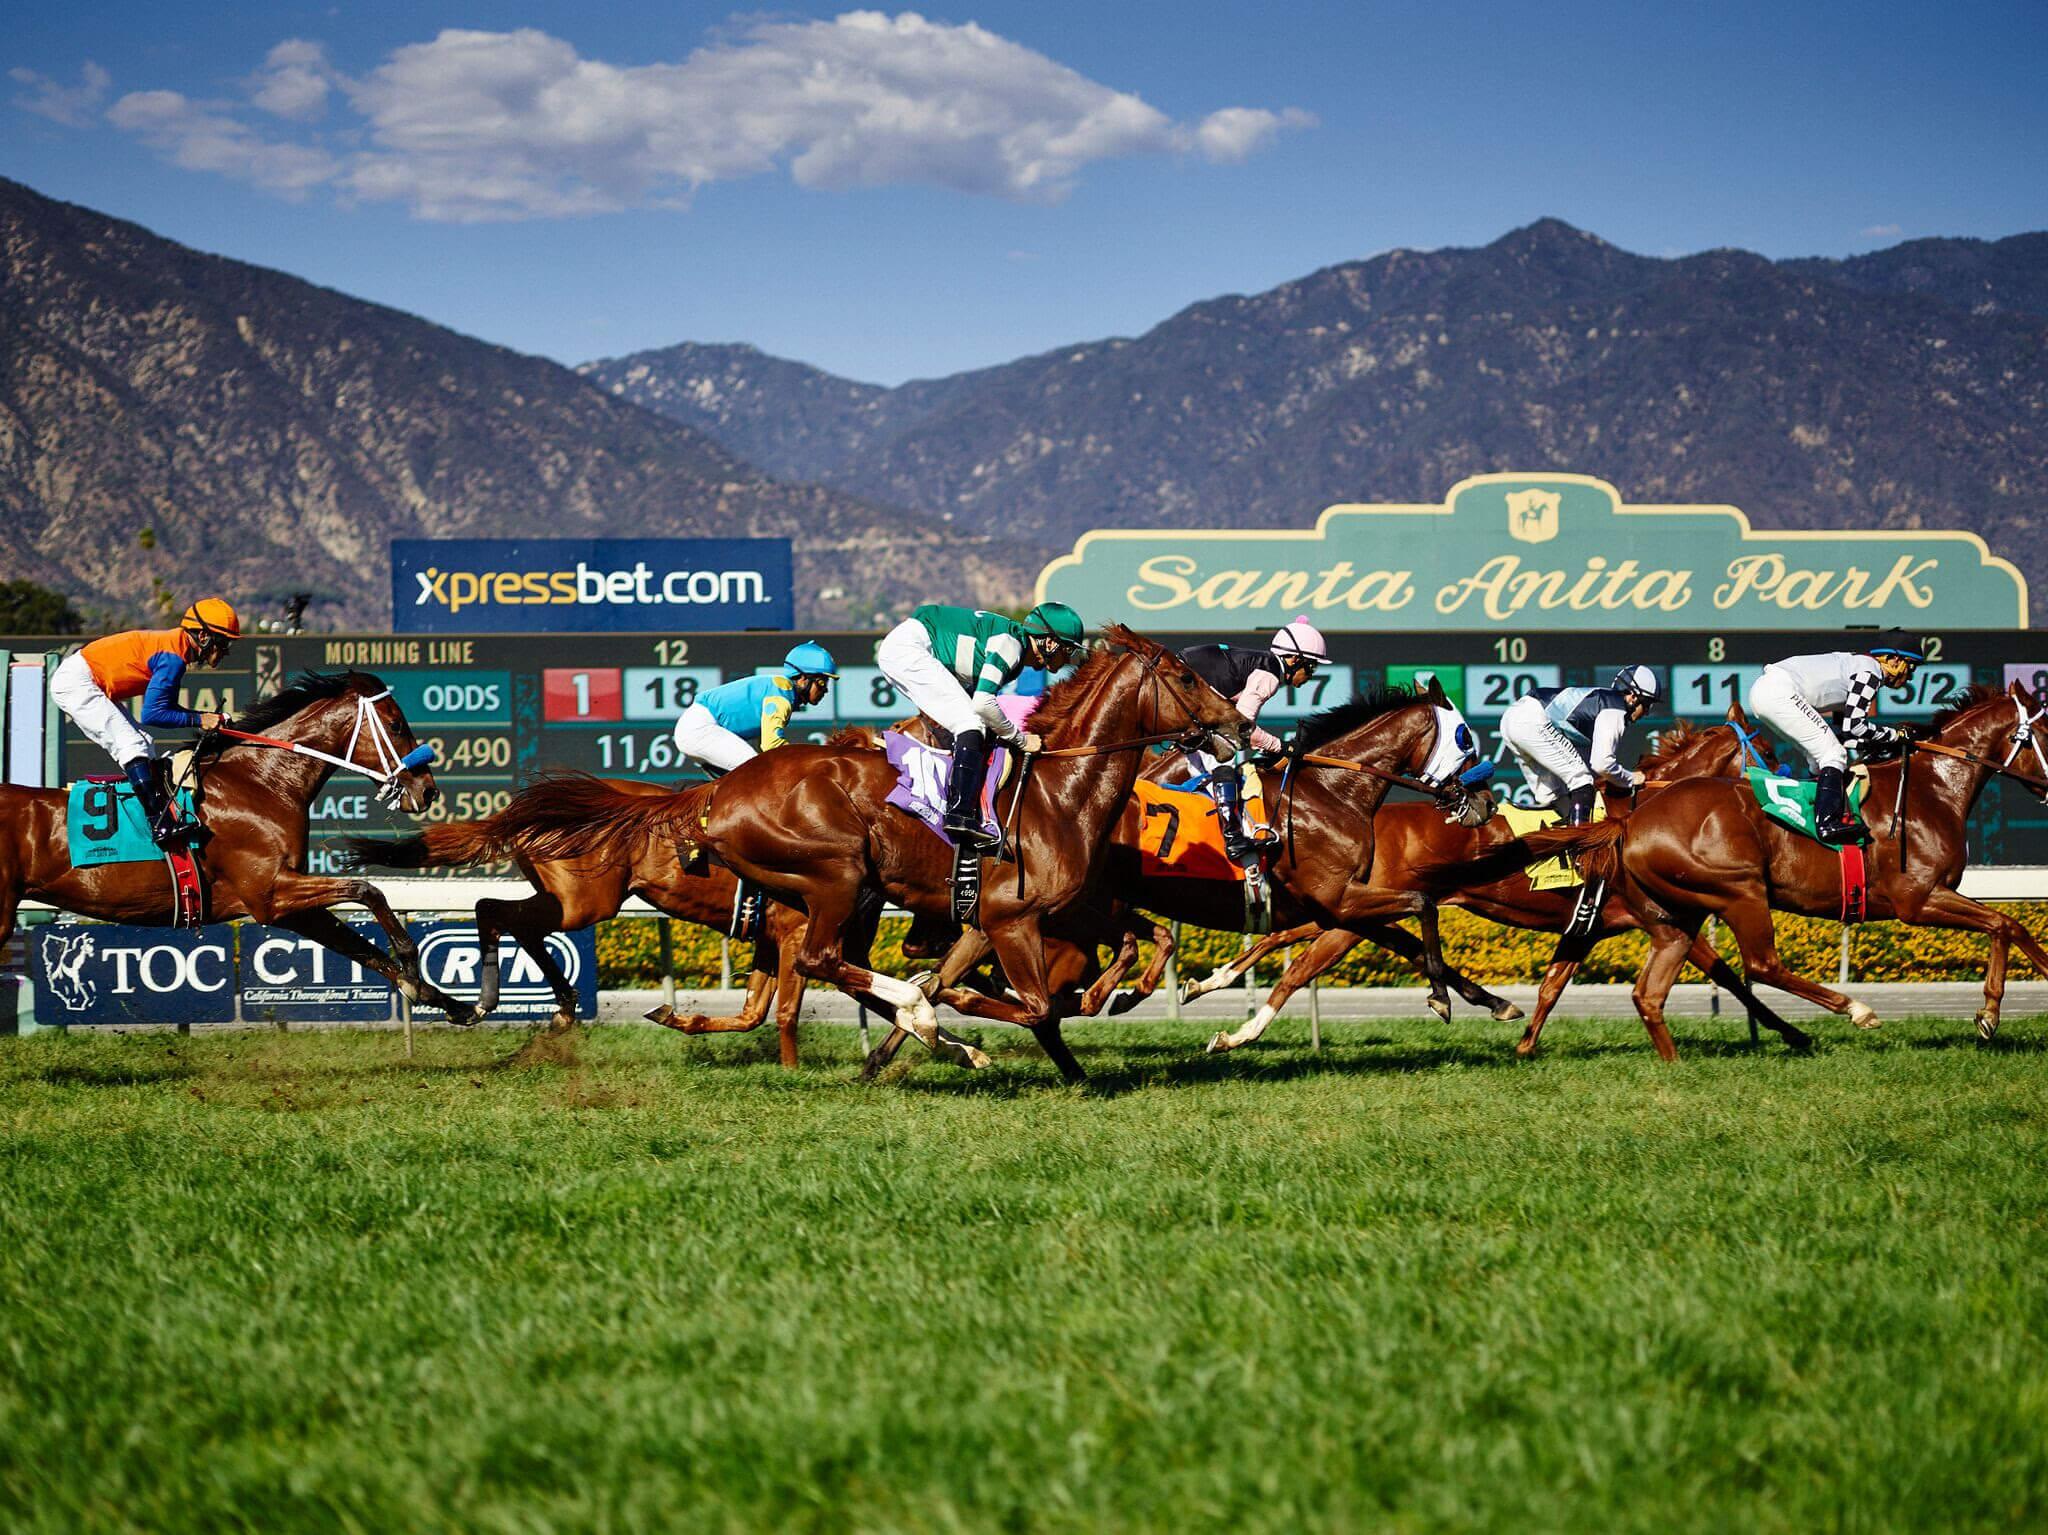 Santa ana park racing race program betting tips tim bettinger photography